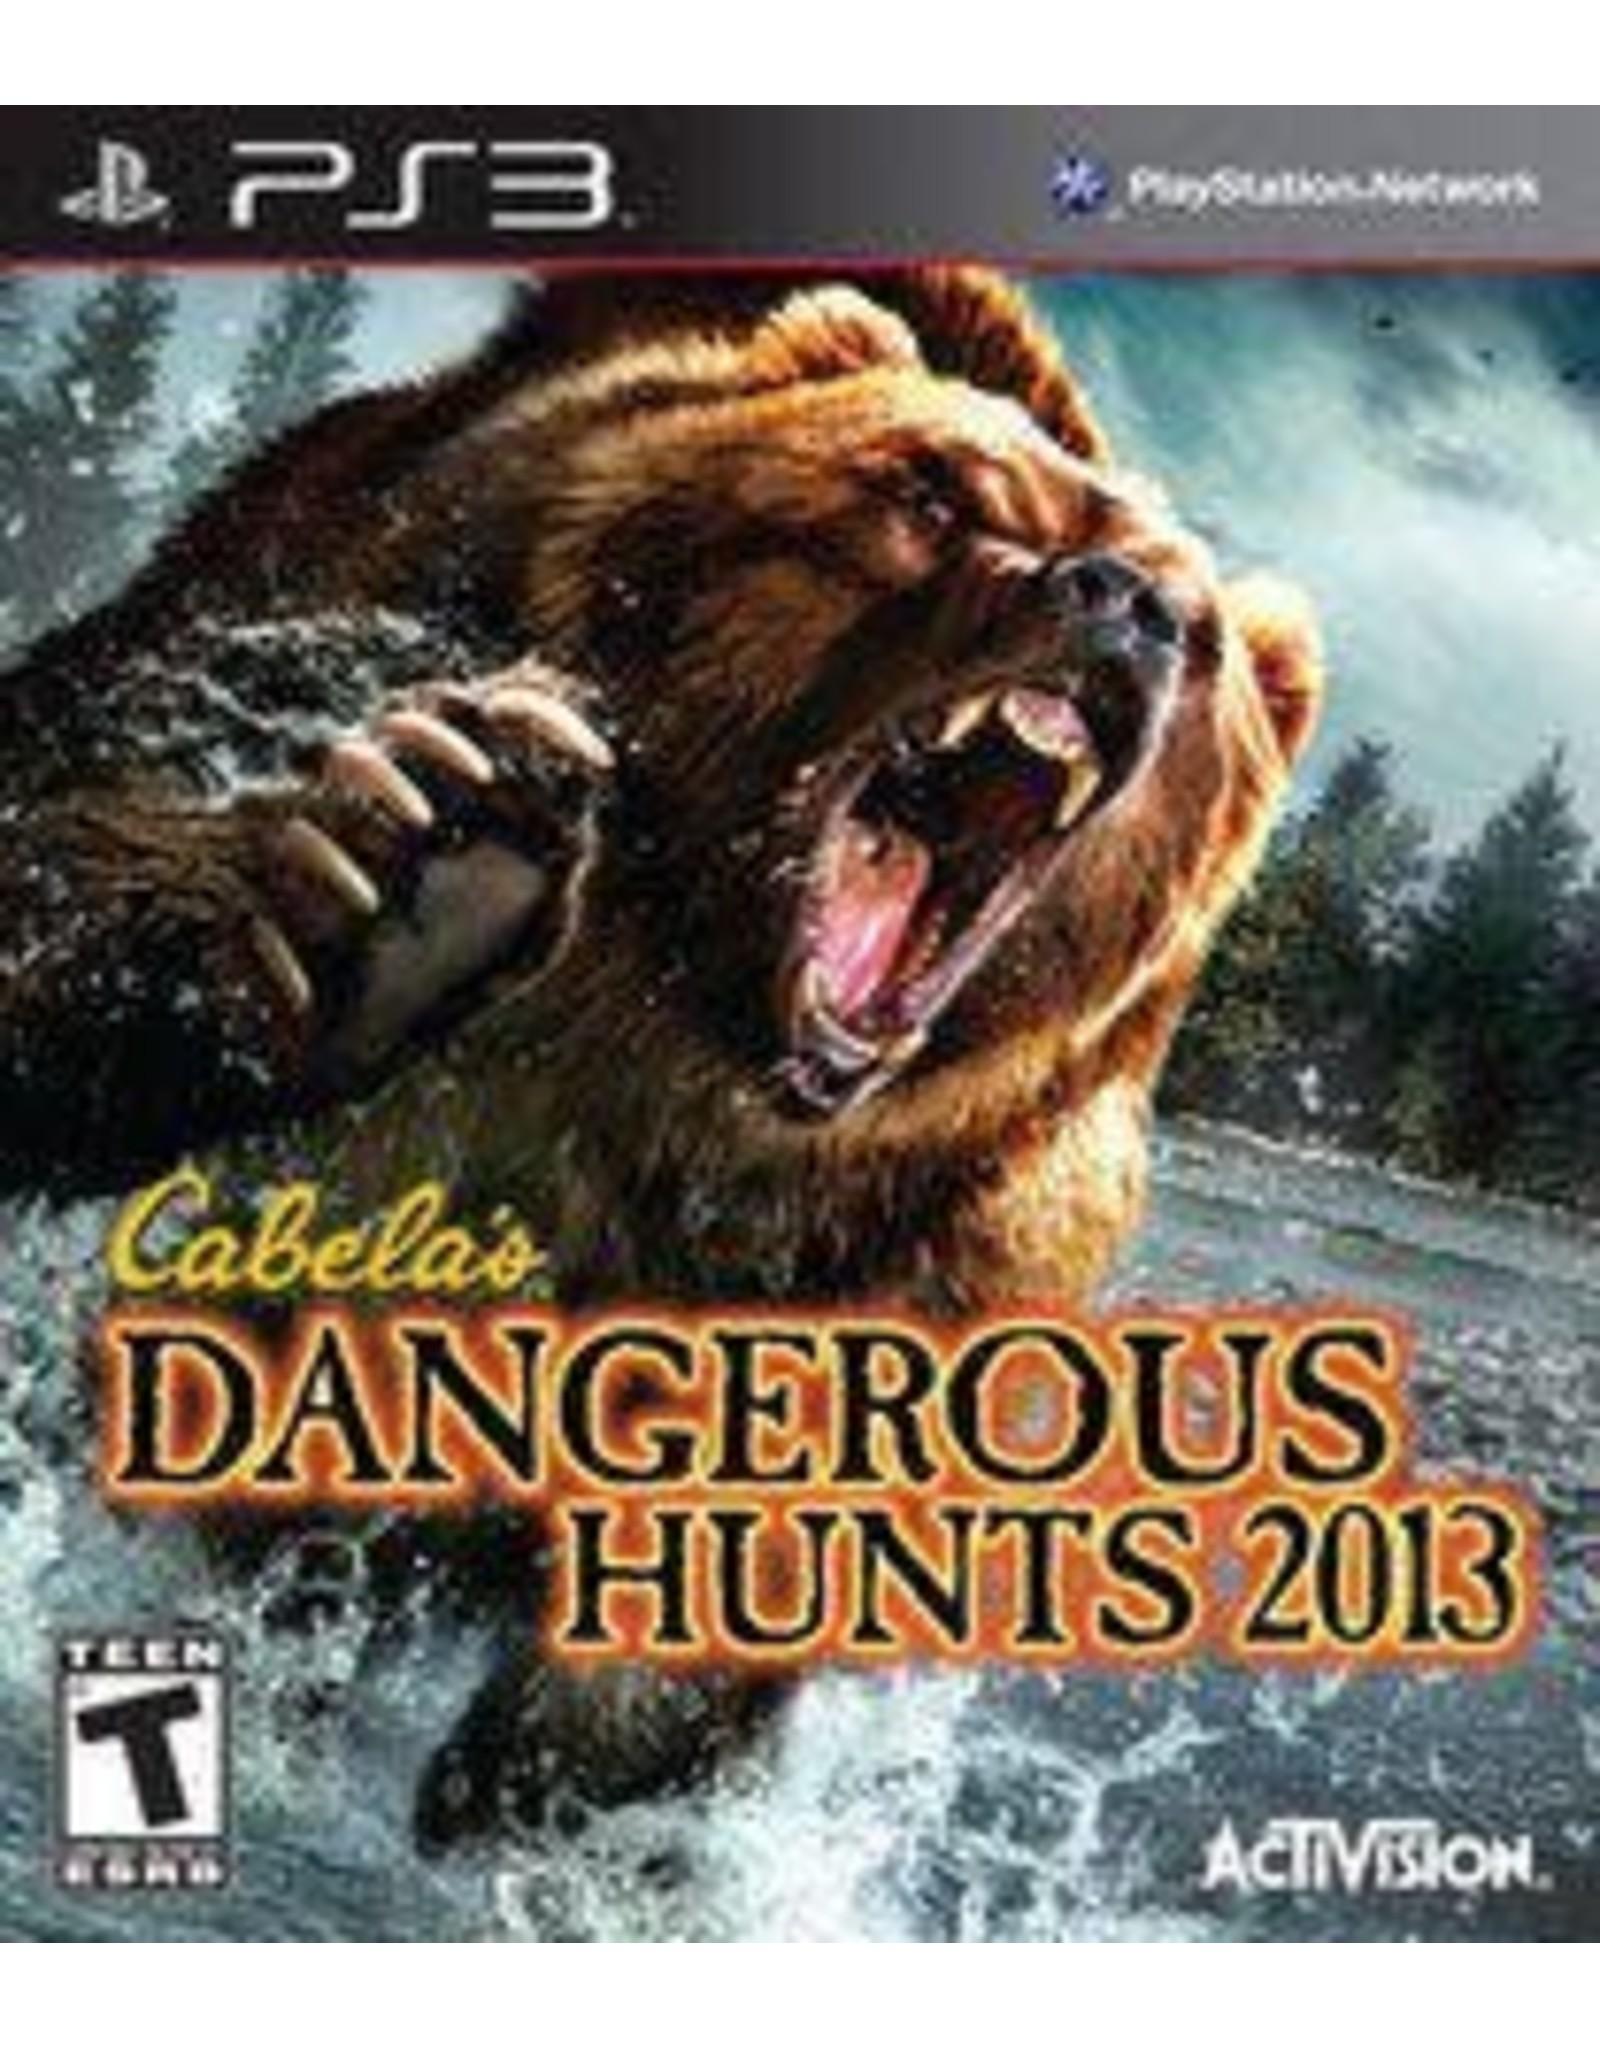 Playstation 3 Cabela's Dangerous Hunts 2013 (CiB)